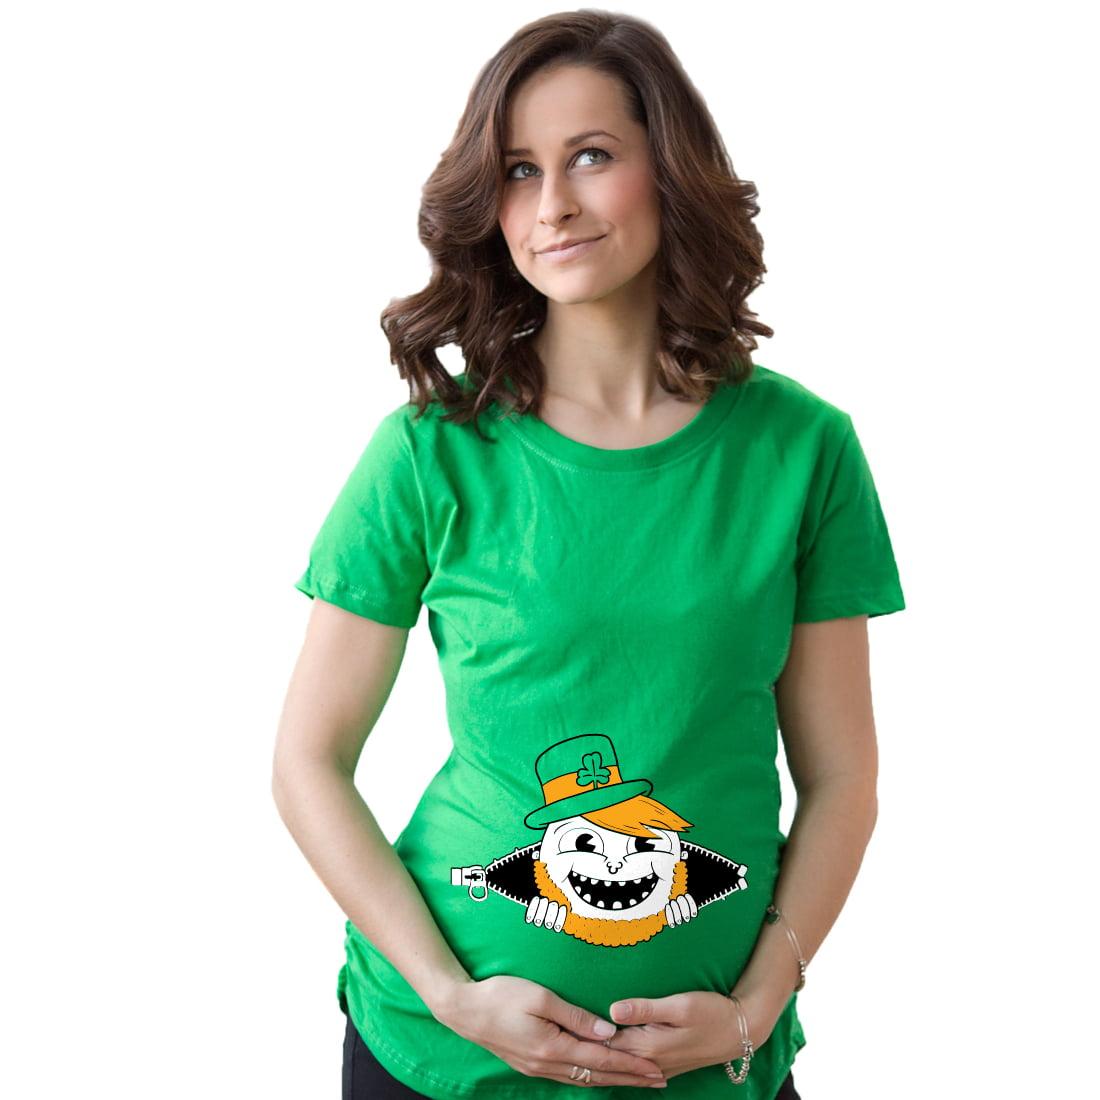 Crazy Dog TShirts - Maternity Peeking Leprechaun Funny T shirts Irish Pregnancy Announcement T shirt